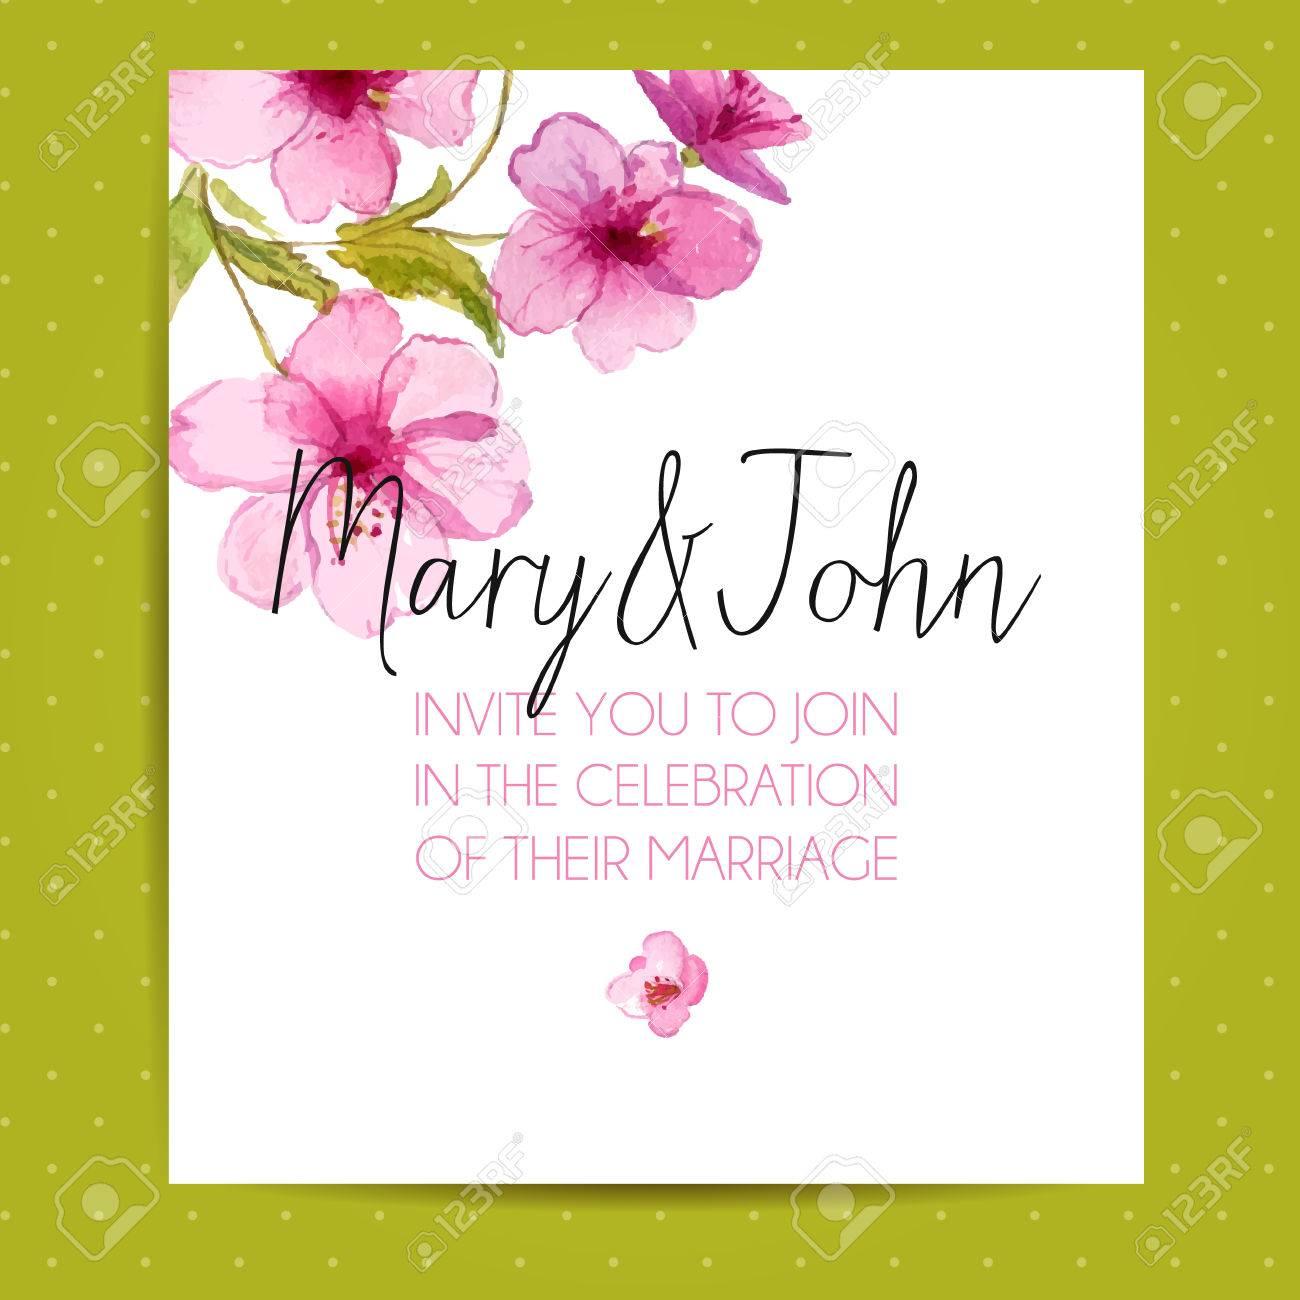 Wedding invitation layout with sakura flowers vector template wedding invitation layout with sakura flowers vector template with watercolor floral art stock vector stopboris Image collections